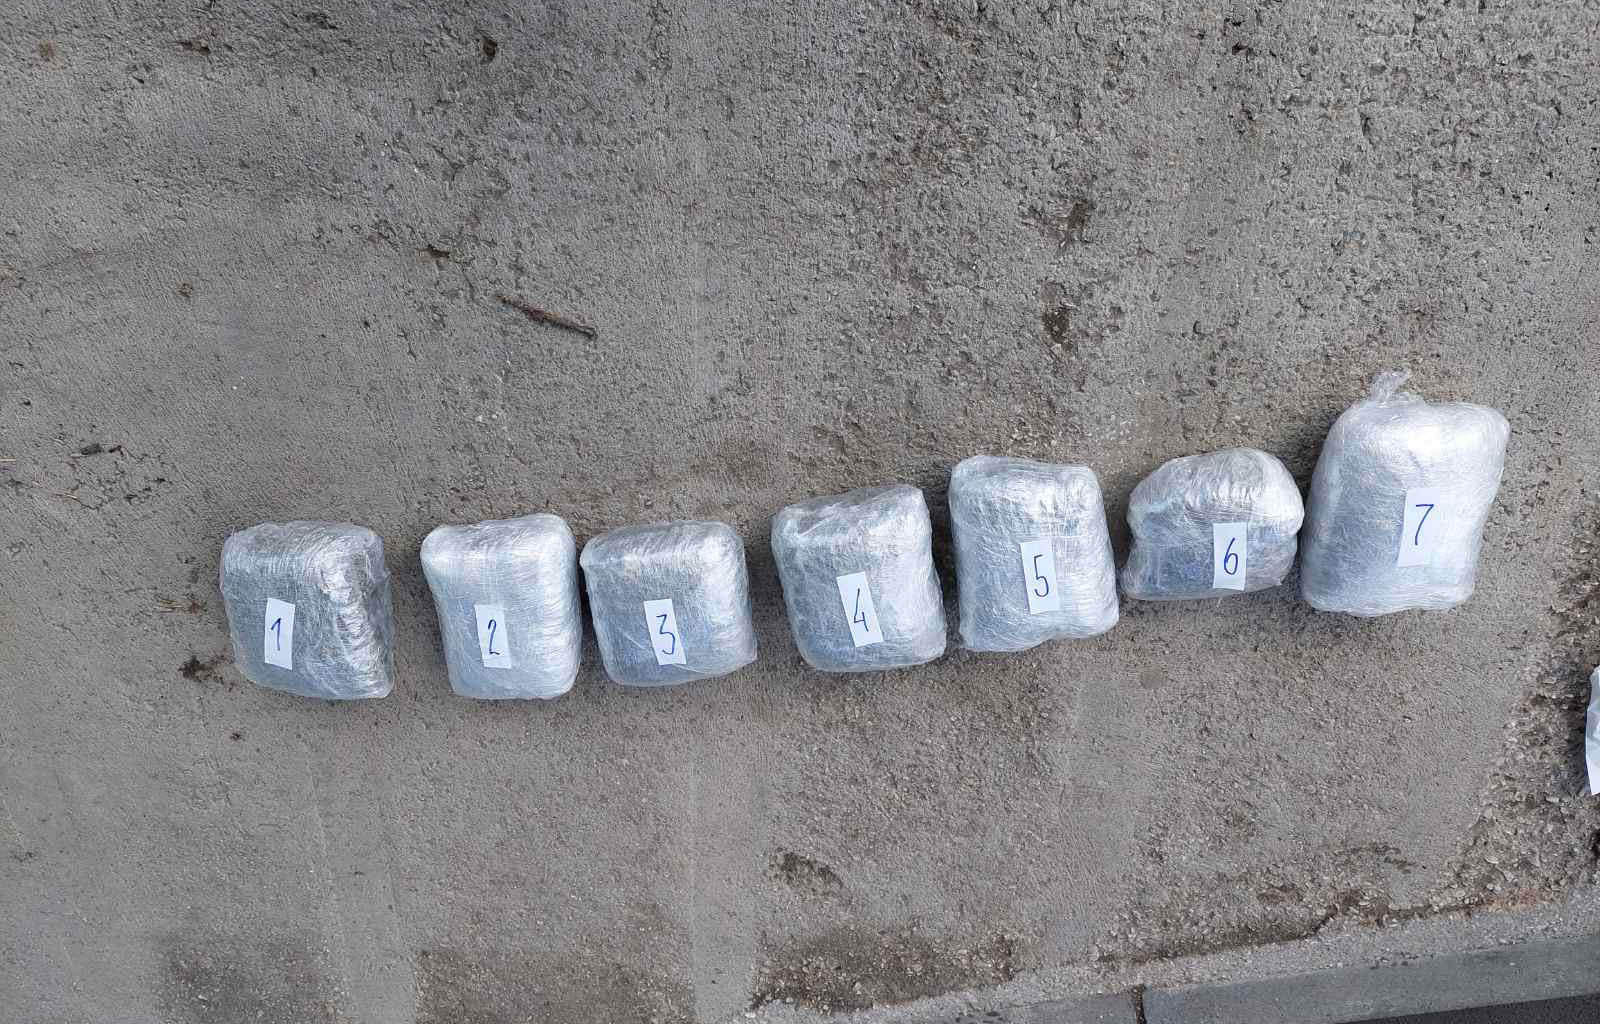 Novopazarac uhvaćen sa 7.5kg droge (video)